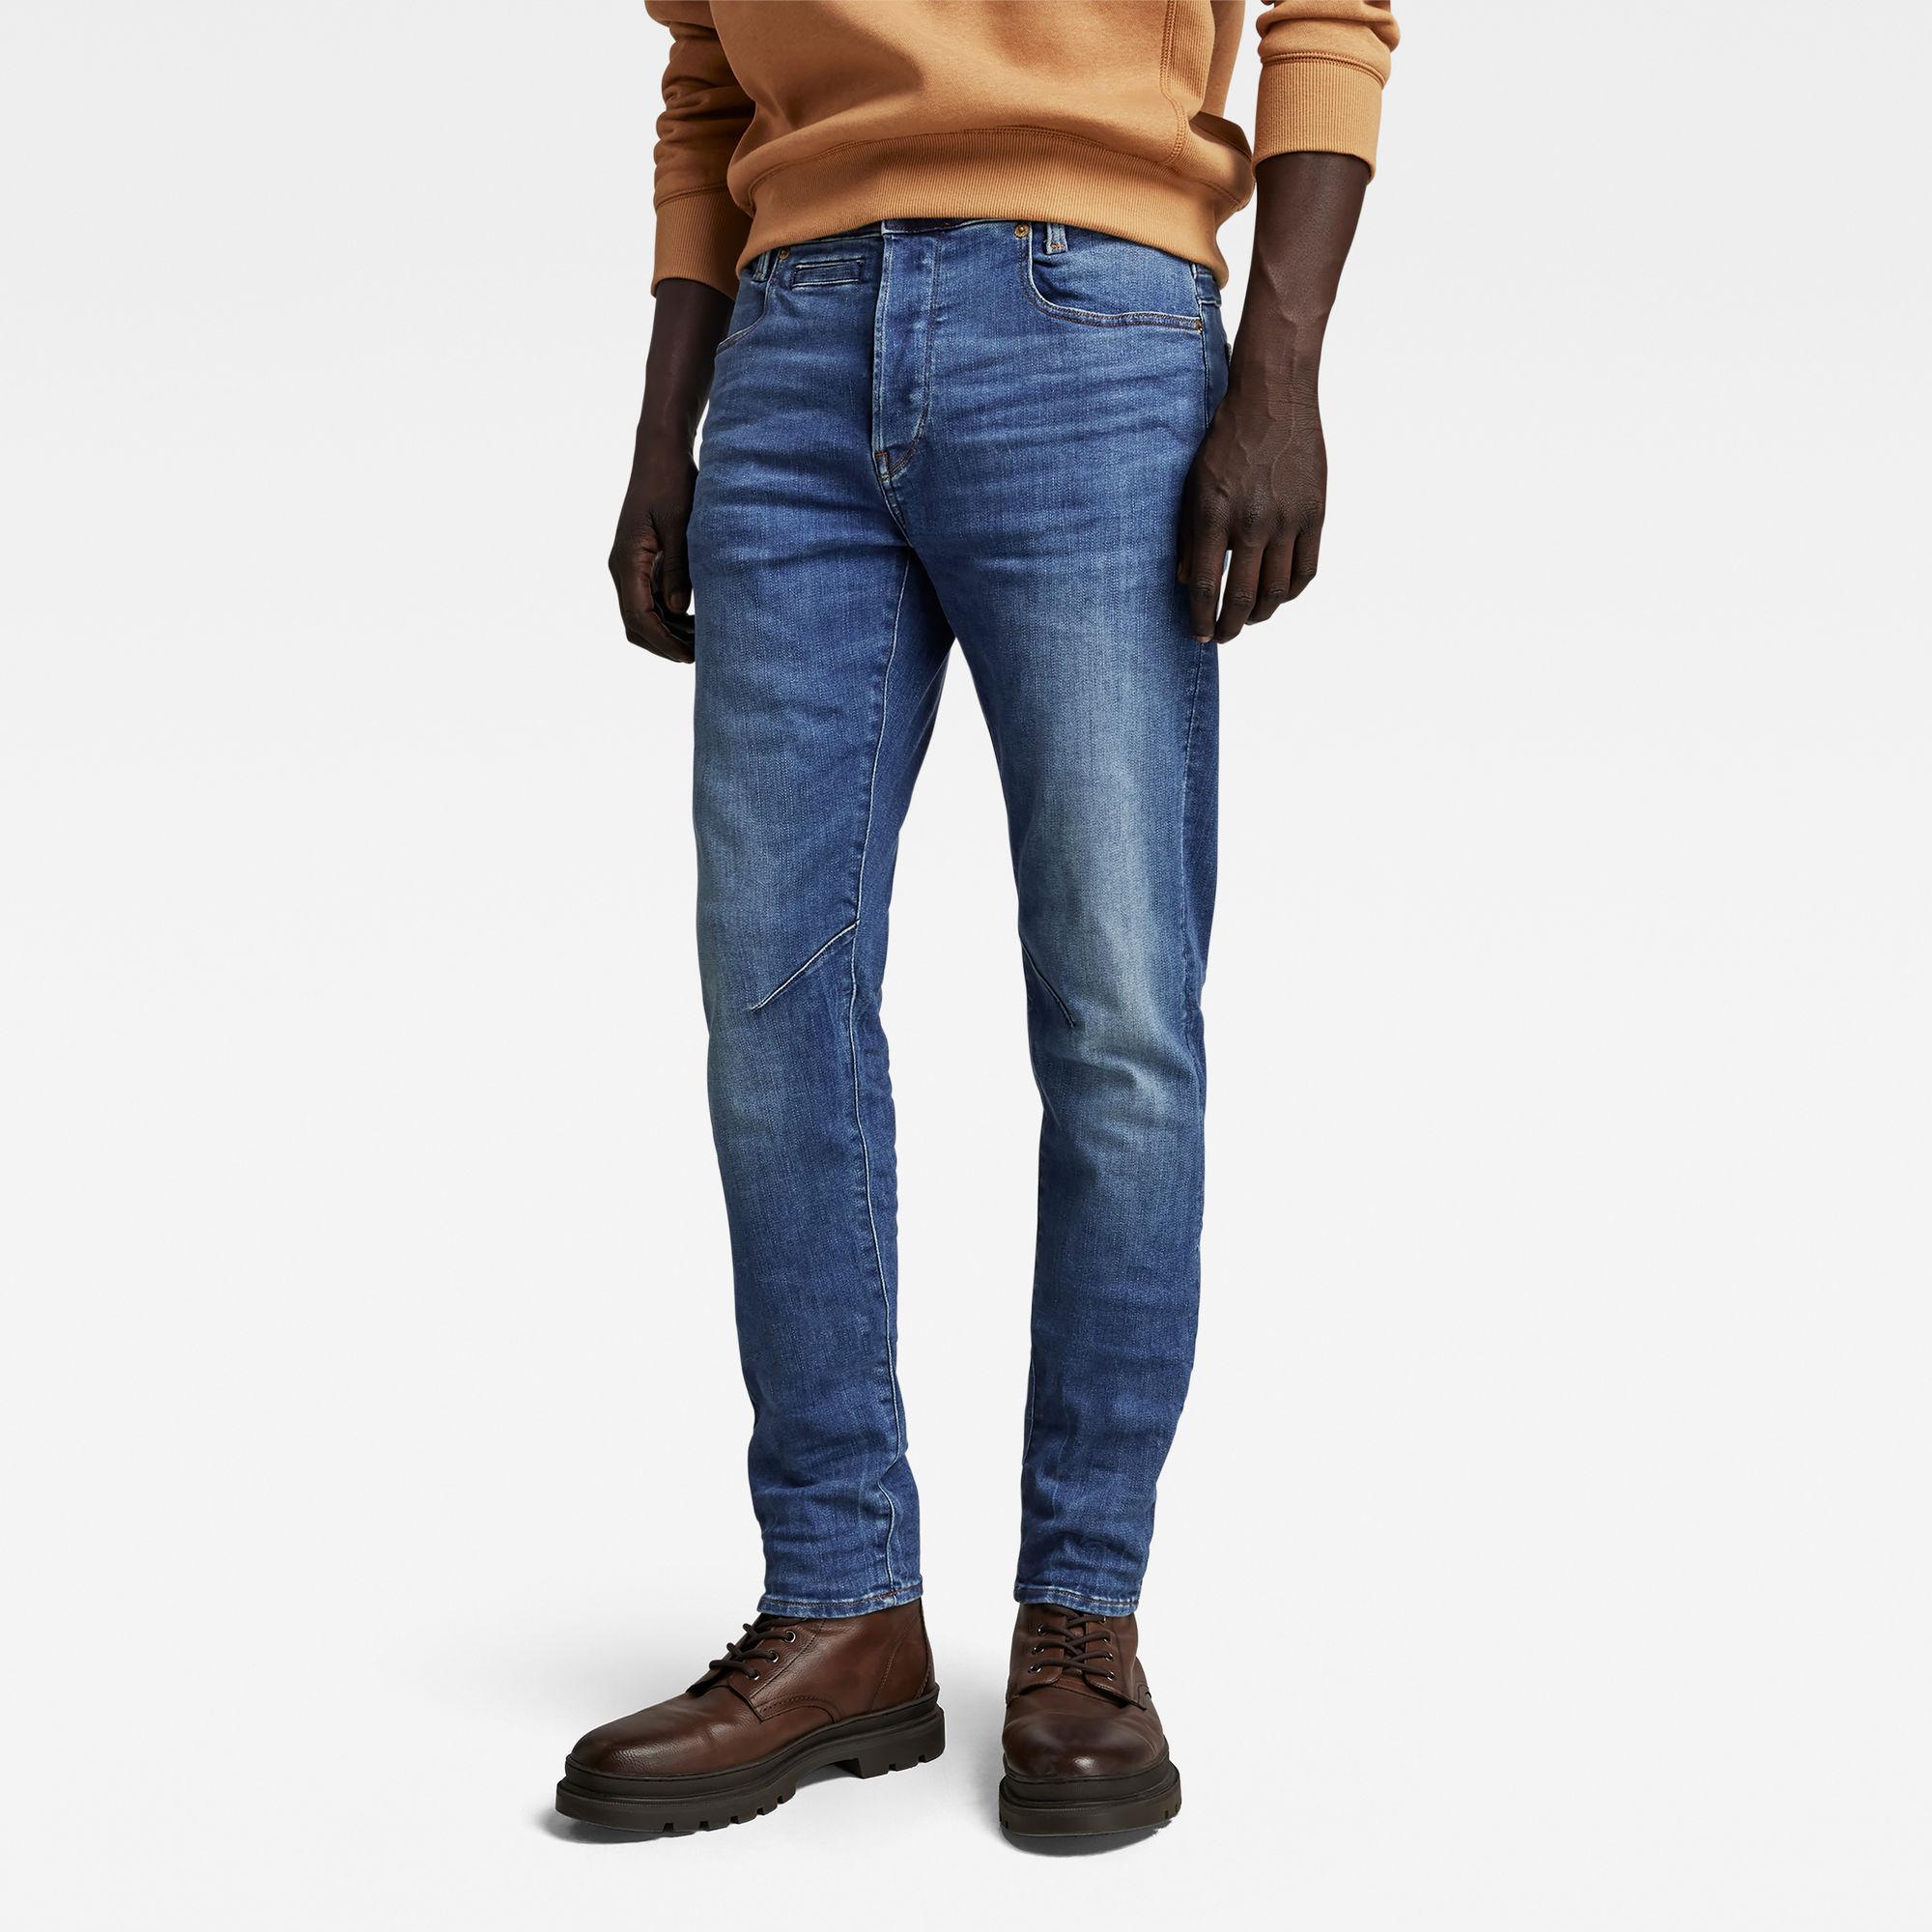 Van G Star Raw D-Staq 5-Pocket Slim Jeans Prijsvergelijk nu!